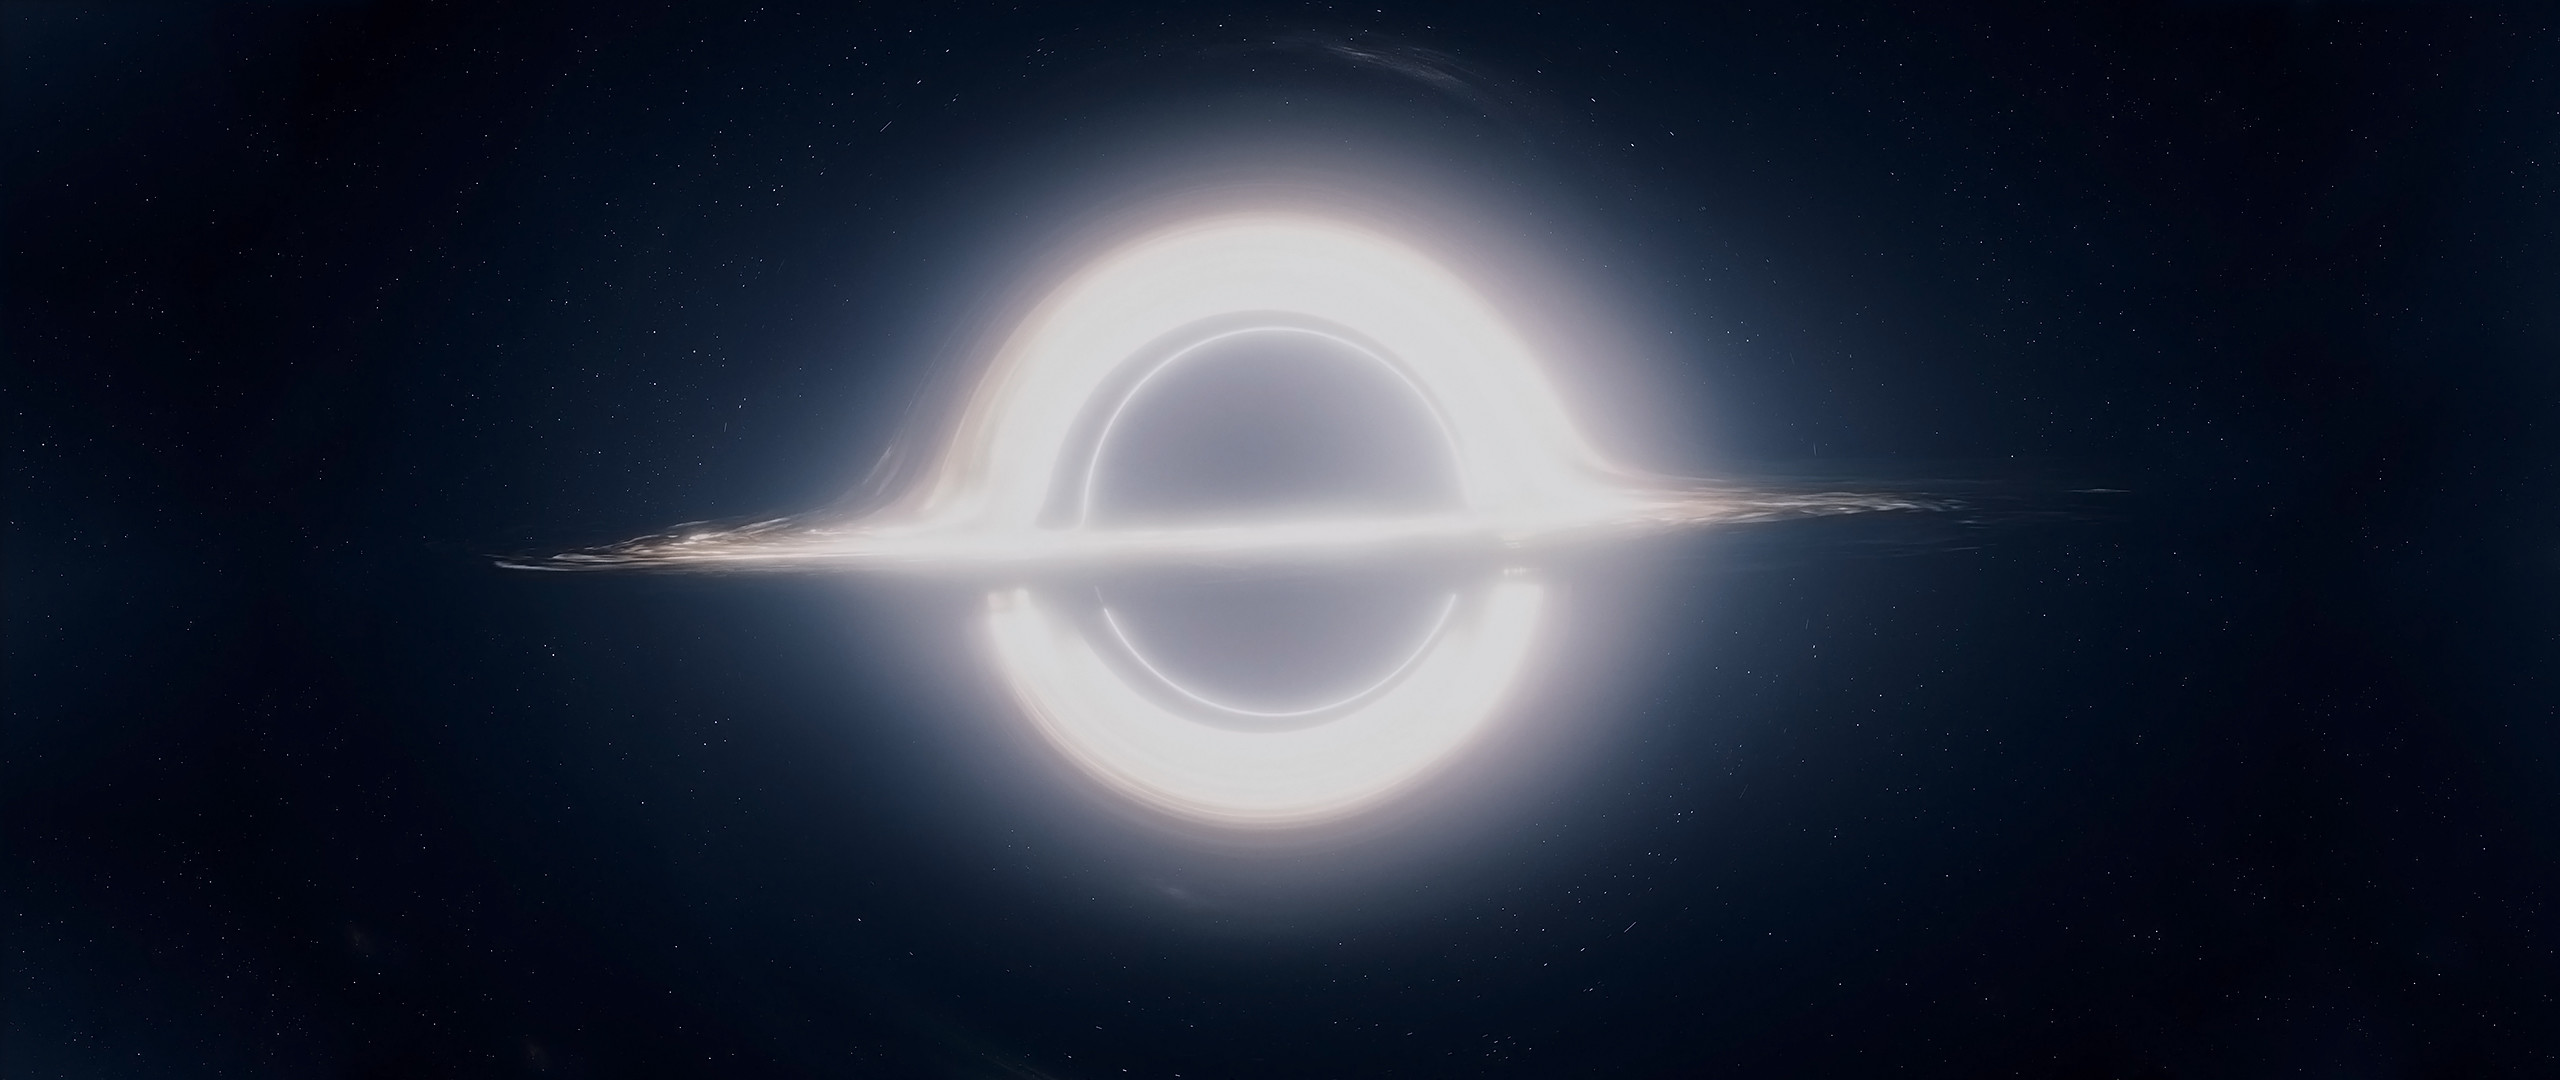 Interstellar Black Hole Wallpaper by ABAthedude Interstellar Black Hole  Wallpaper by ABAthedude